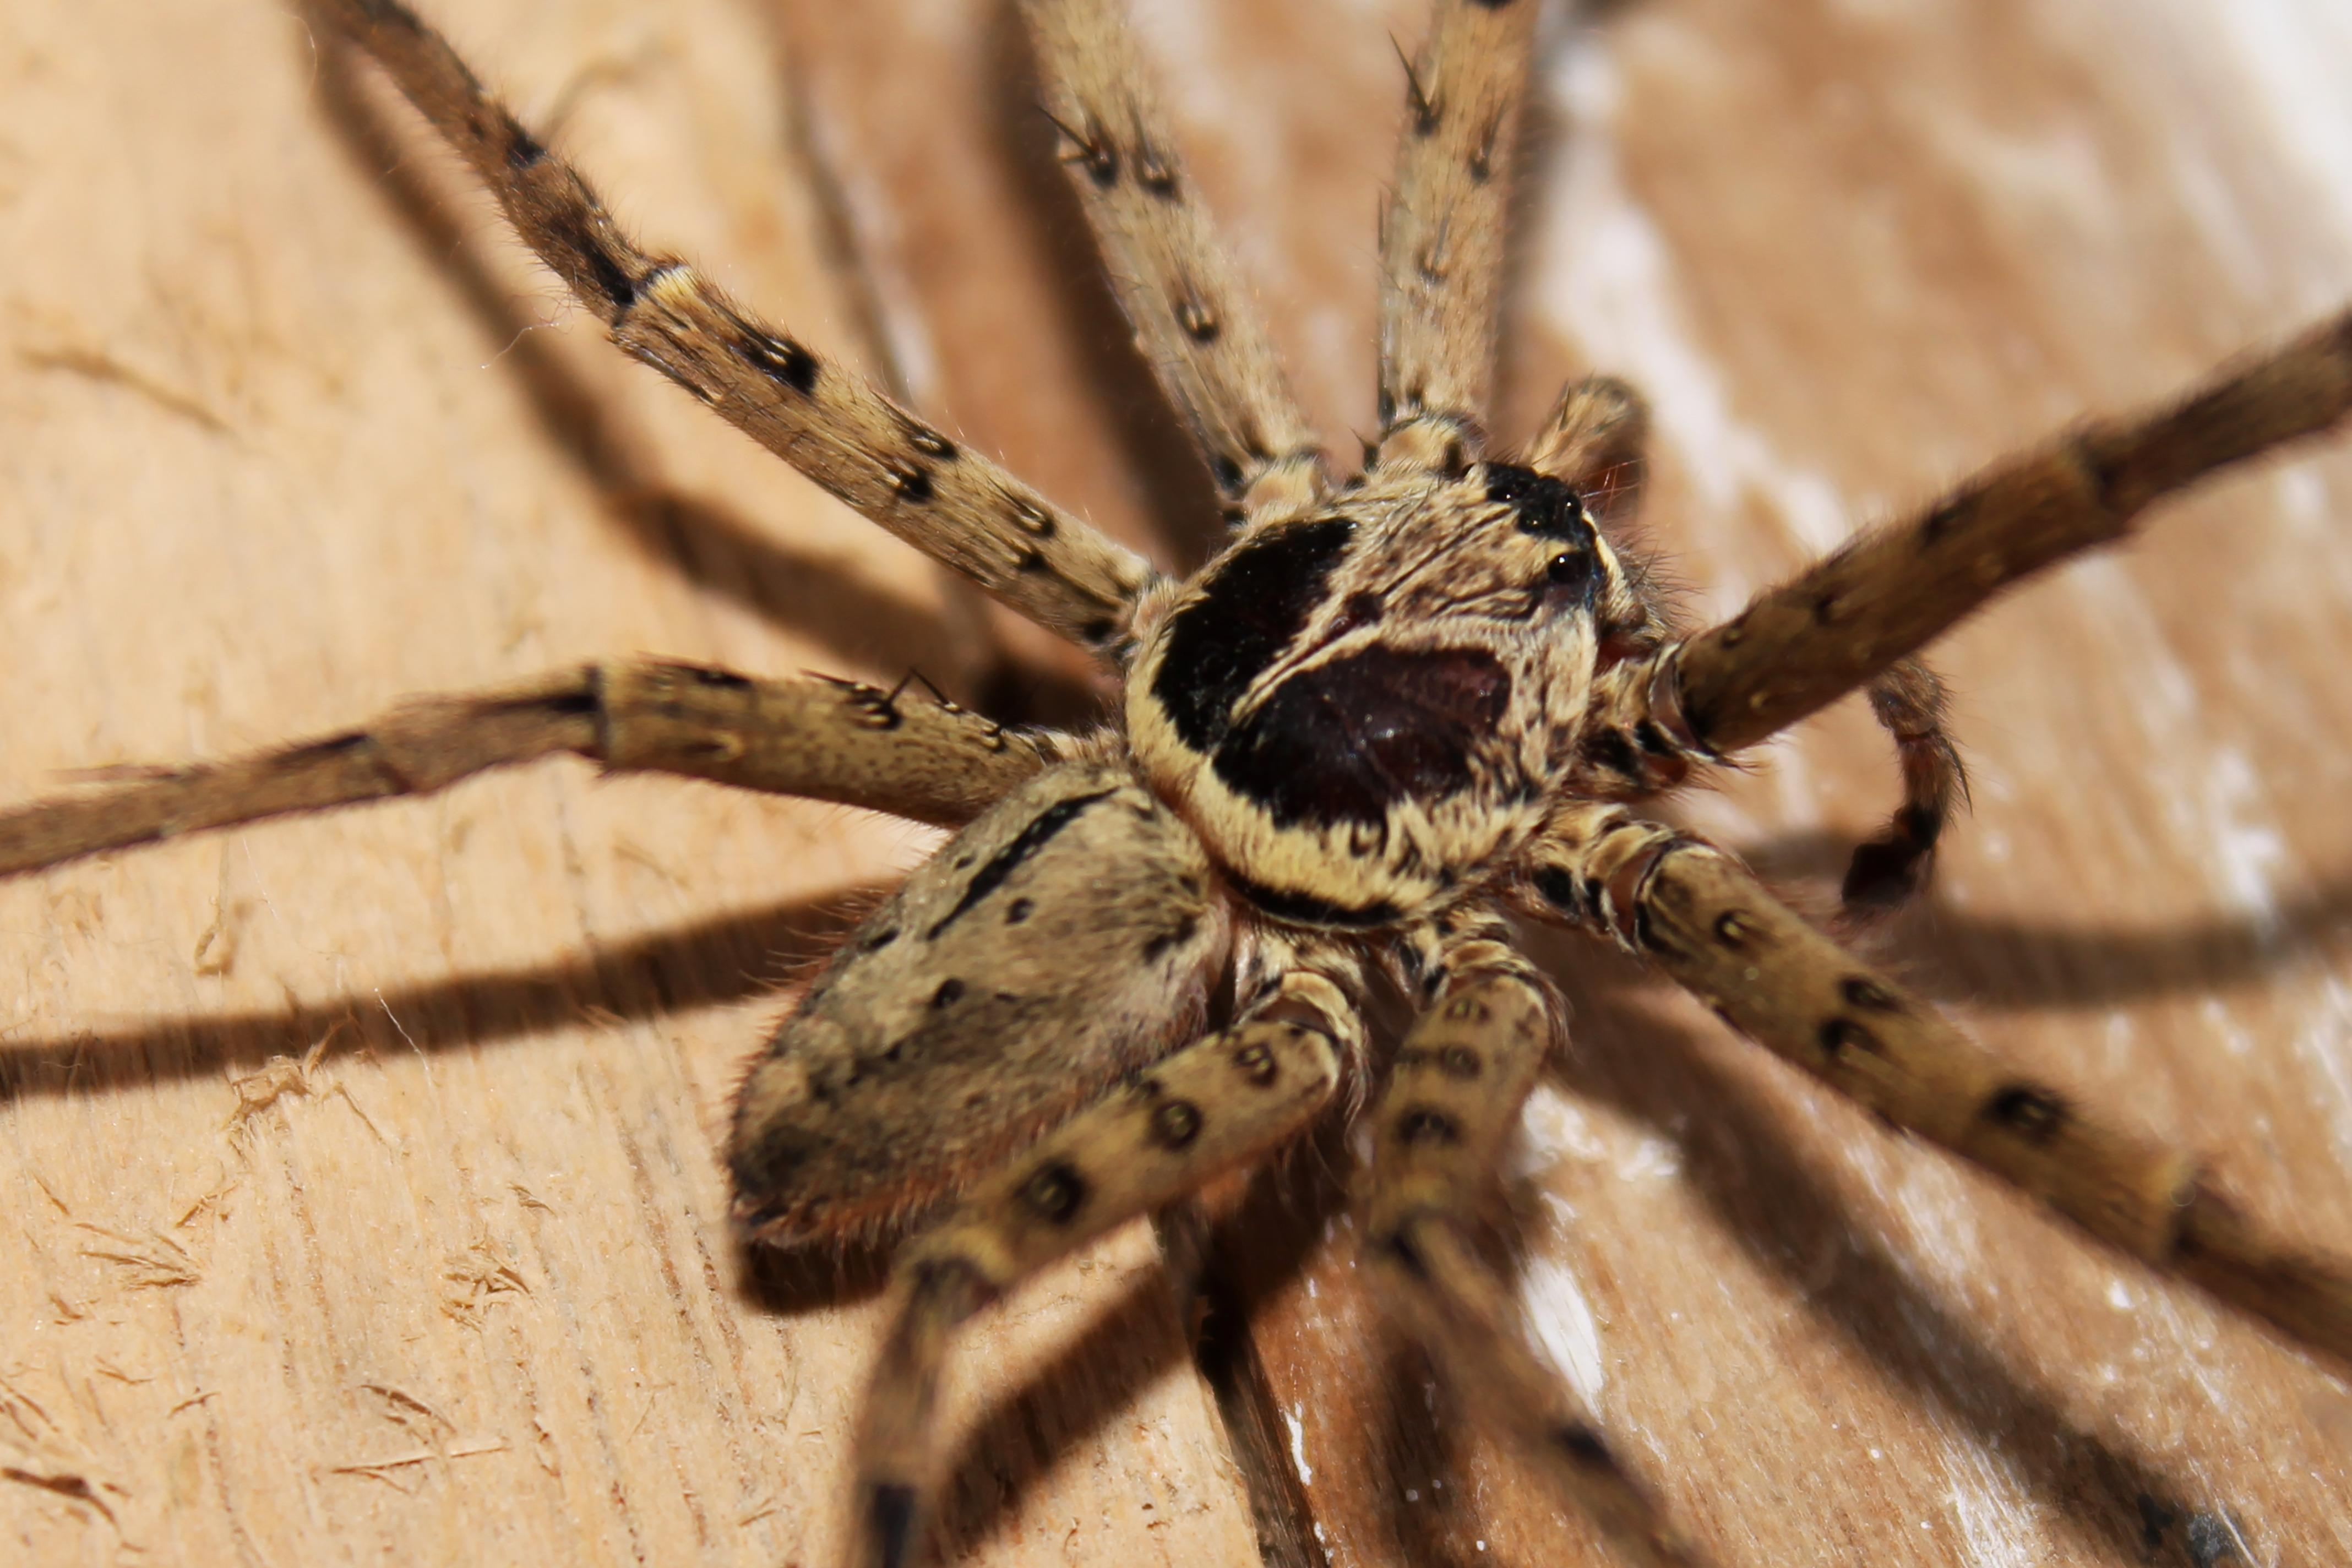 halloween bug fauna invertebrate close up crawling crawl scary danger arachnid creepy horror tarantula dangerous phobia macro photography - Phobia Halloween